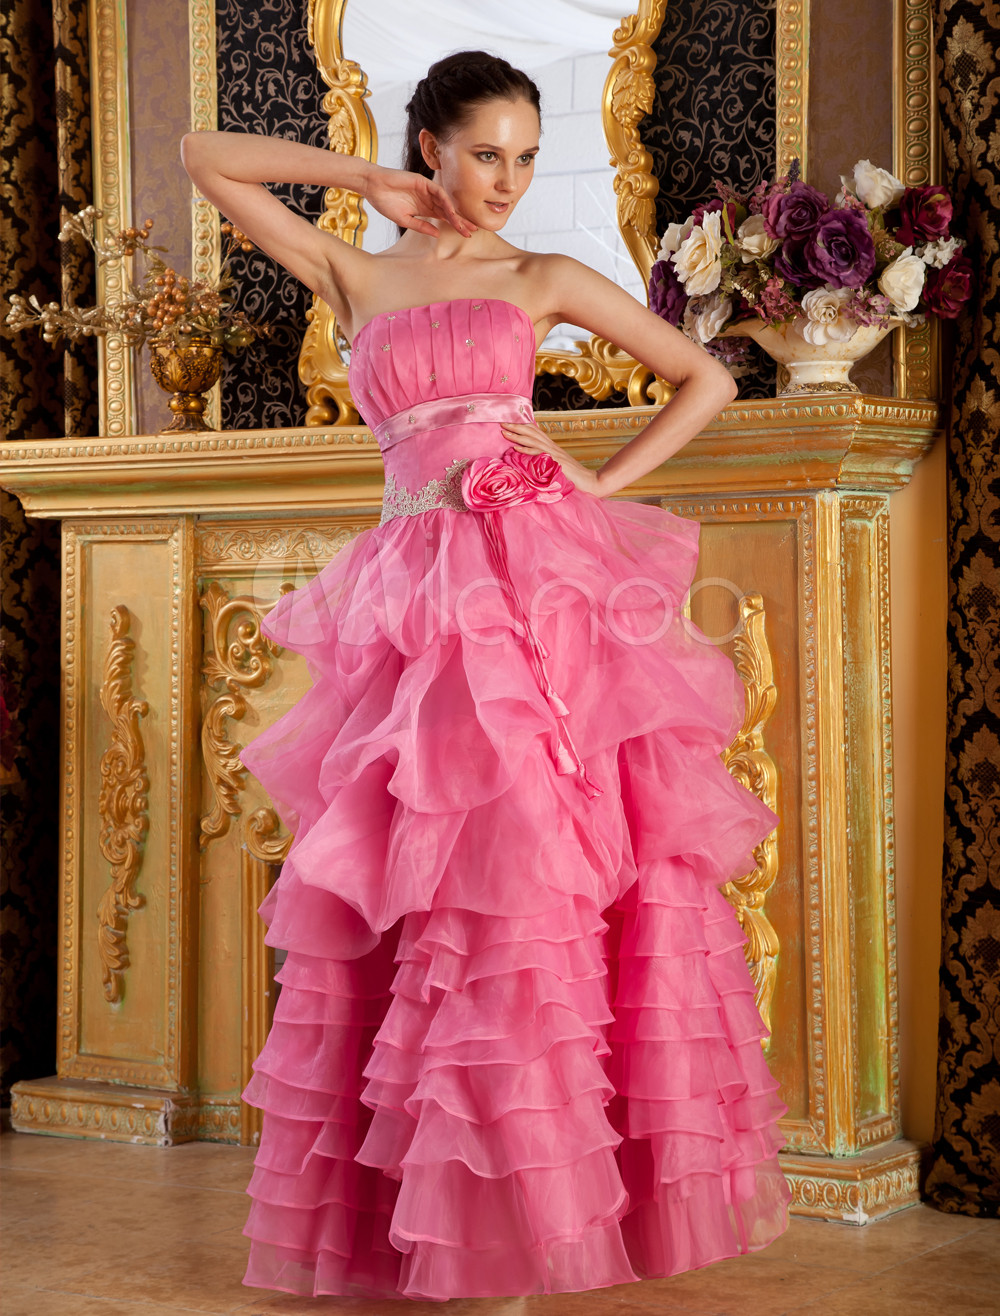 Strapless Tiered Organza Woman's Prom Dress (Wedding Prom Dresses) photo